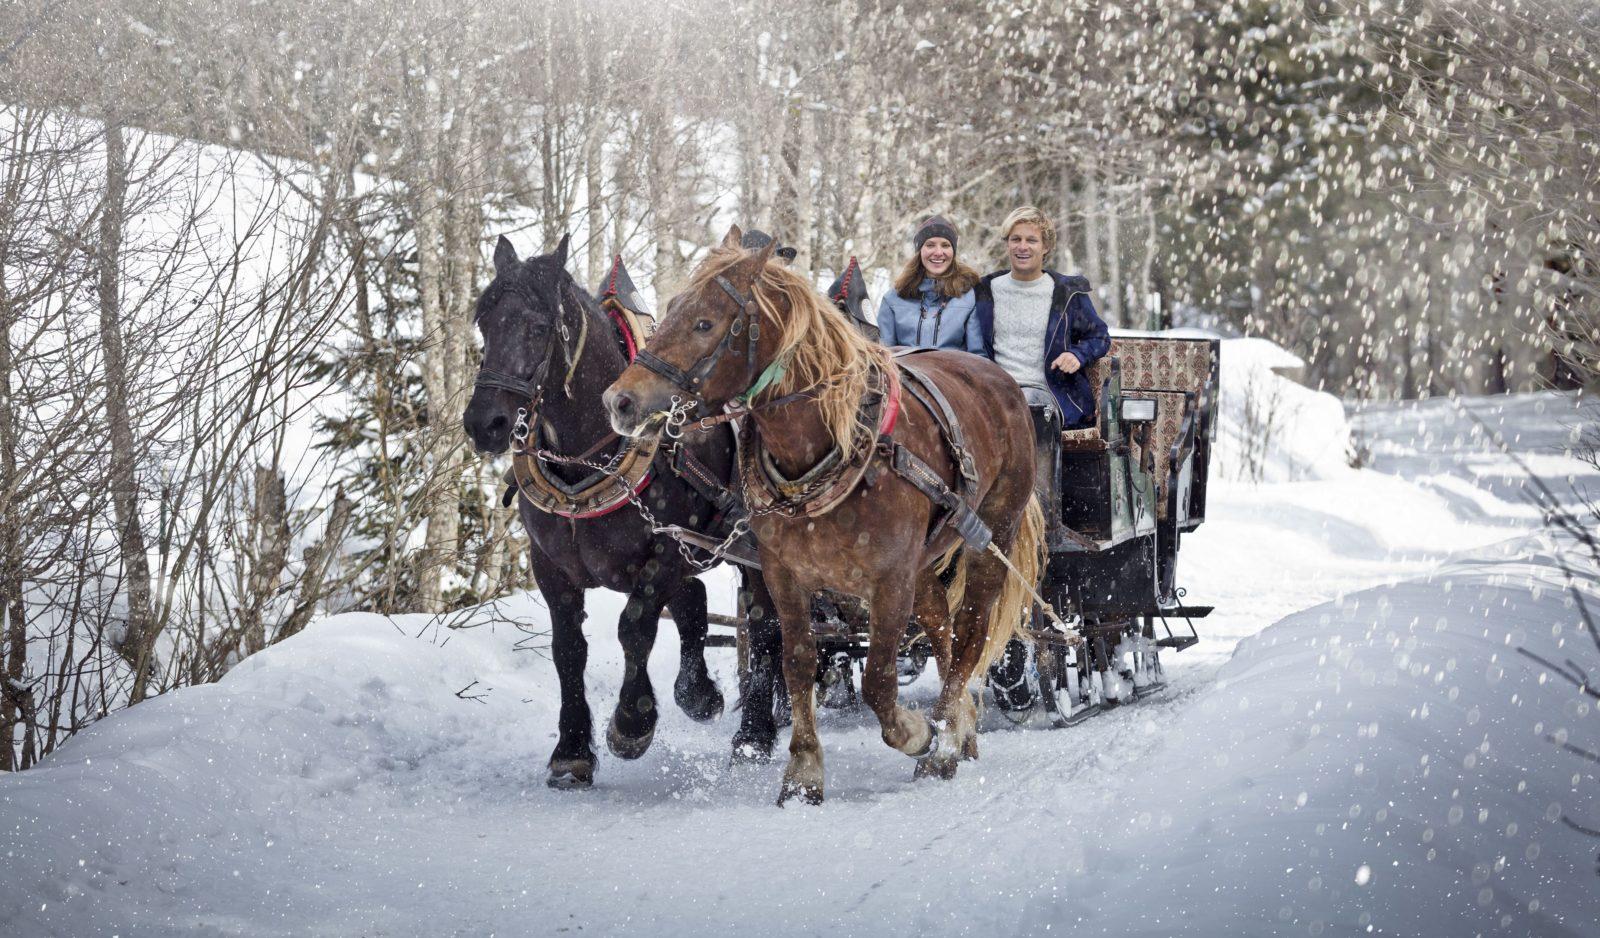 Pferdeschlitten in Saalbach Hinterglemm